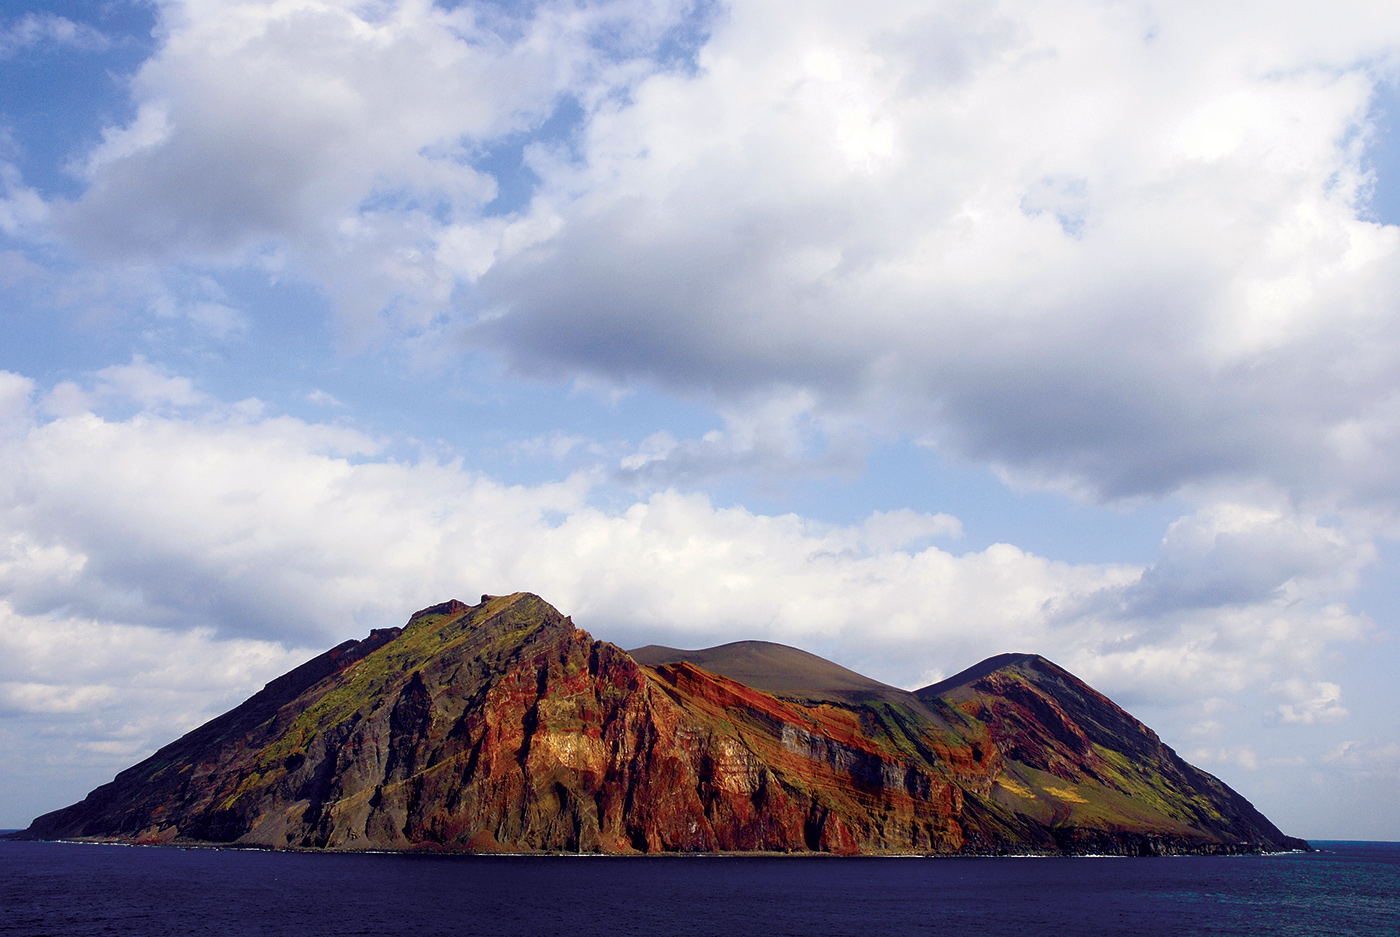 Approaching the island of Torishima.